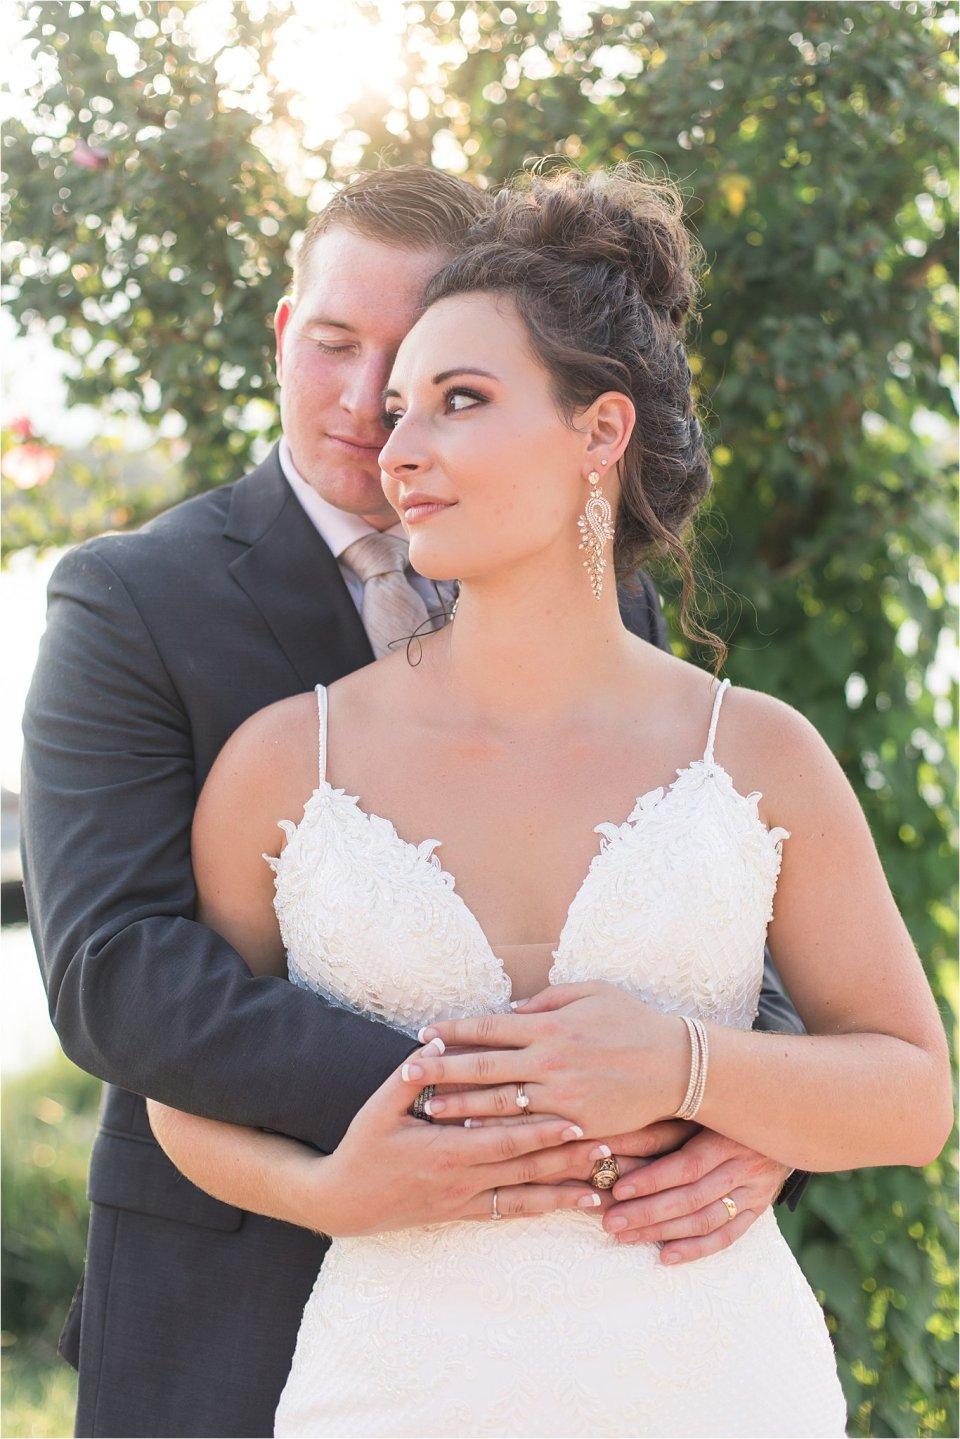 Groom holding bride at Lake of Egypt wedding